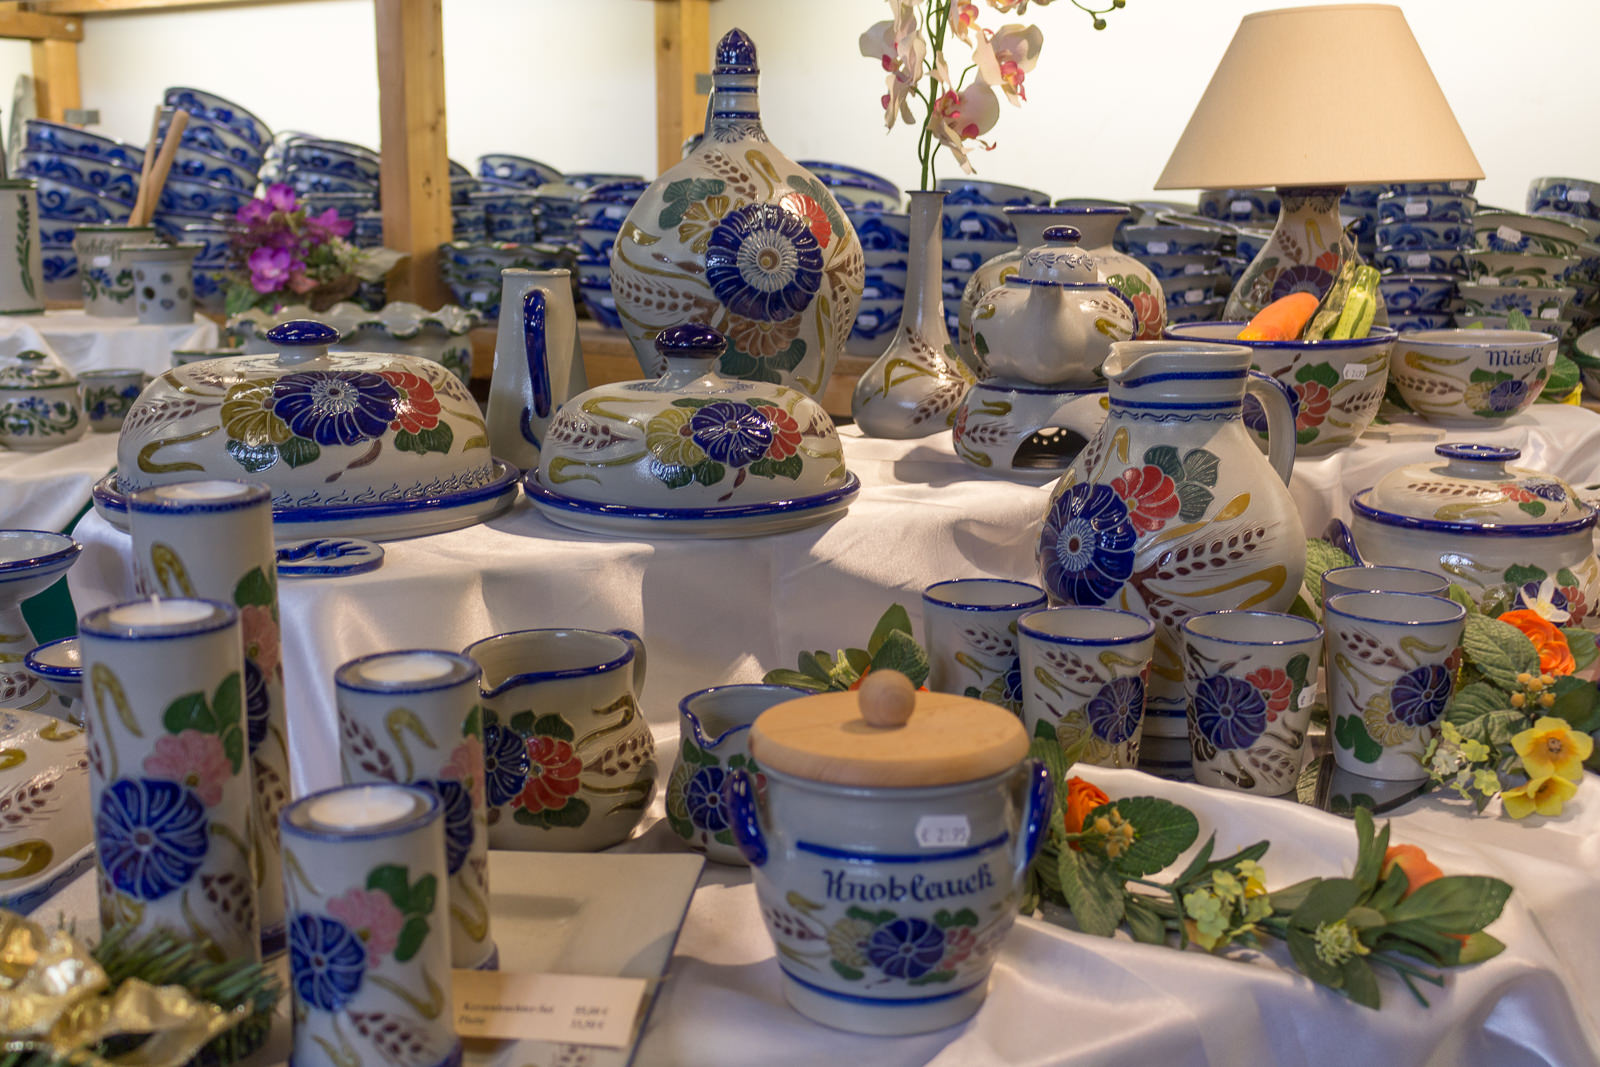 kannenbäckerland, #visitkeramik, Höhr-Grenzhausen, #RLPerleben, Ton, Keramik, Keramikkunst, Künstler, Manufaktur, Töpfern, girmscheid töpferei